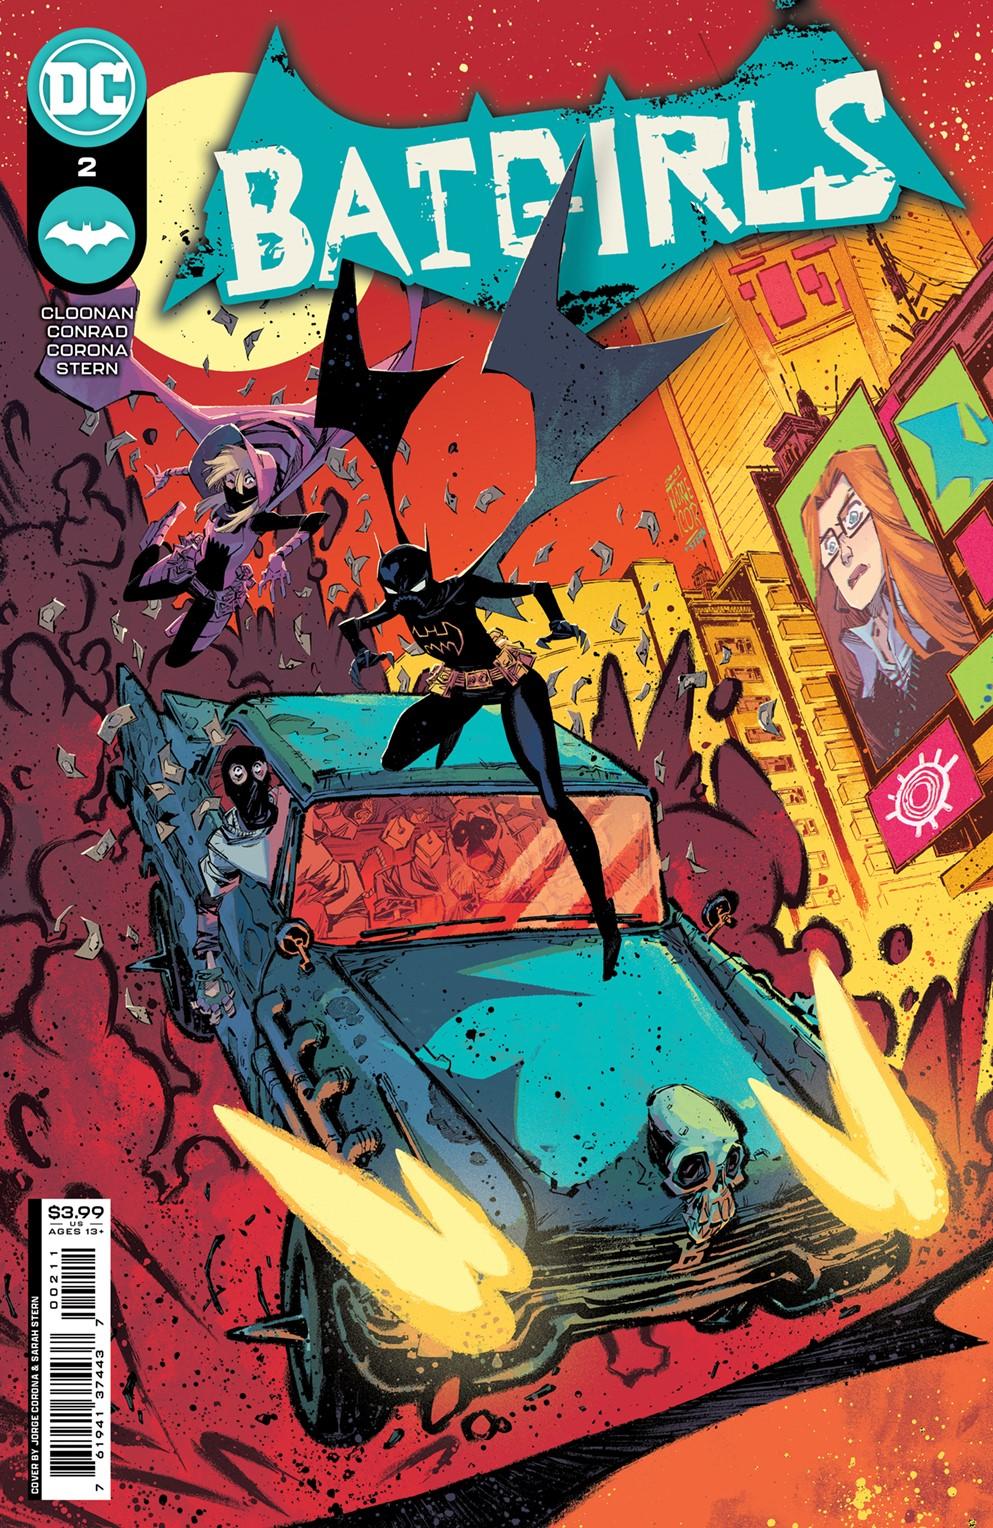 Batgirls_Cv2_main_JorgeCorona-logo DC Comics December 2021 Solicitations